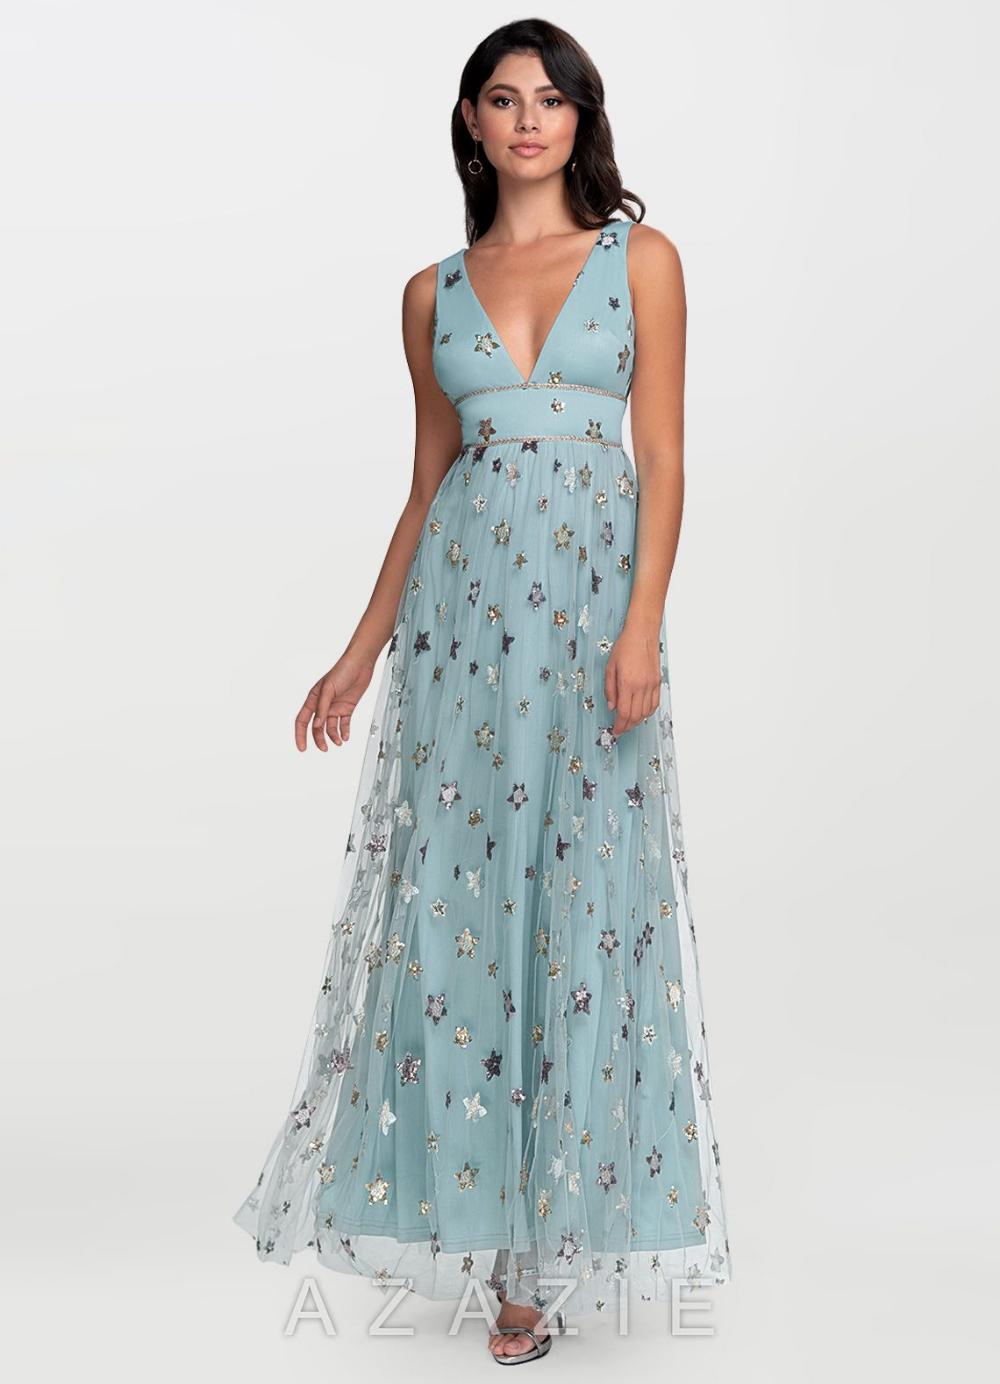 Kiss Of Stars Slate Blue Embroidery Maxi Dress Wedding Guest Dress Azazie Dresses Dresses [ 1384 x 1000 Pixel ]